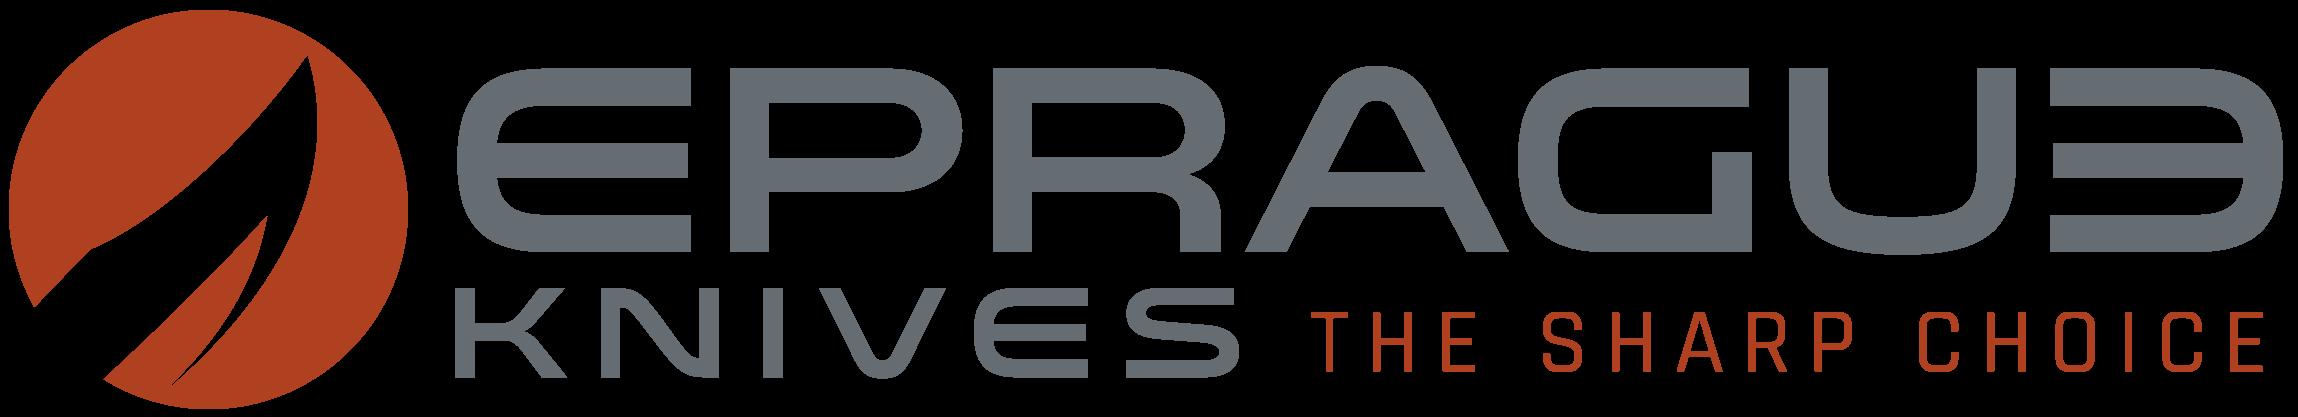 ePrague, LLC